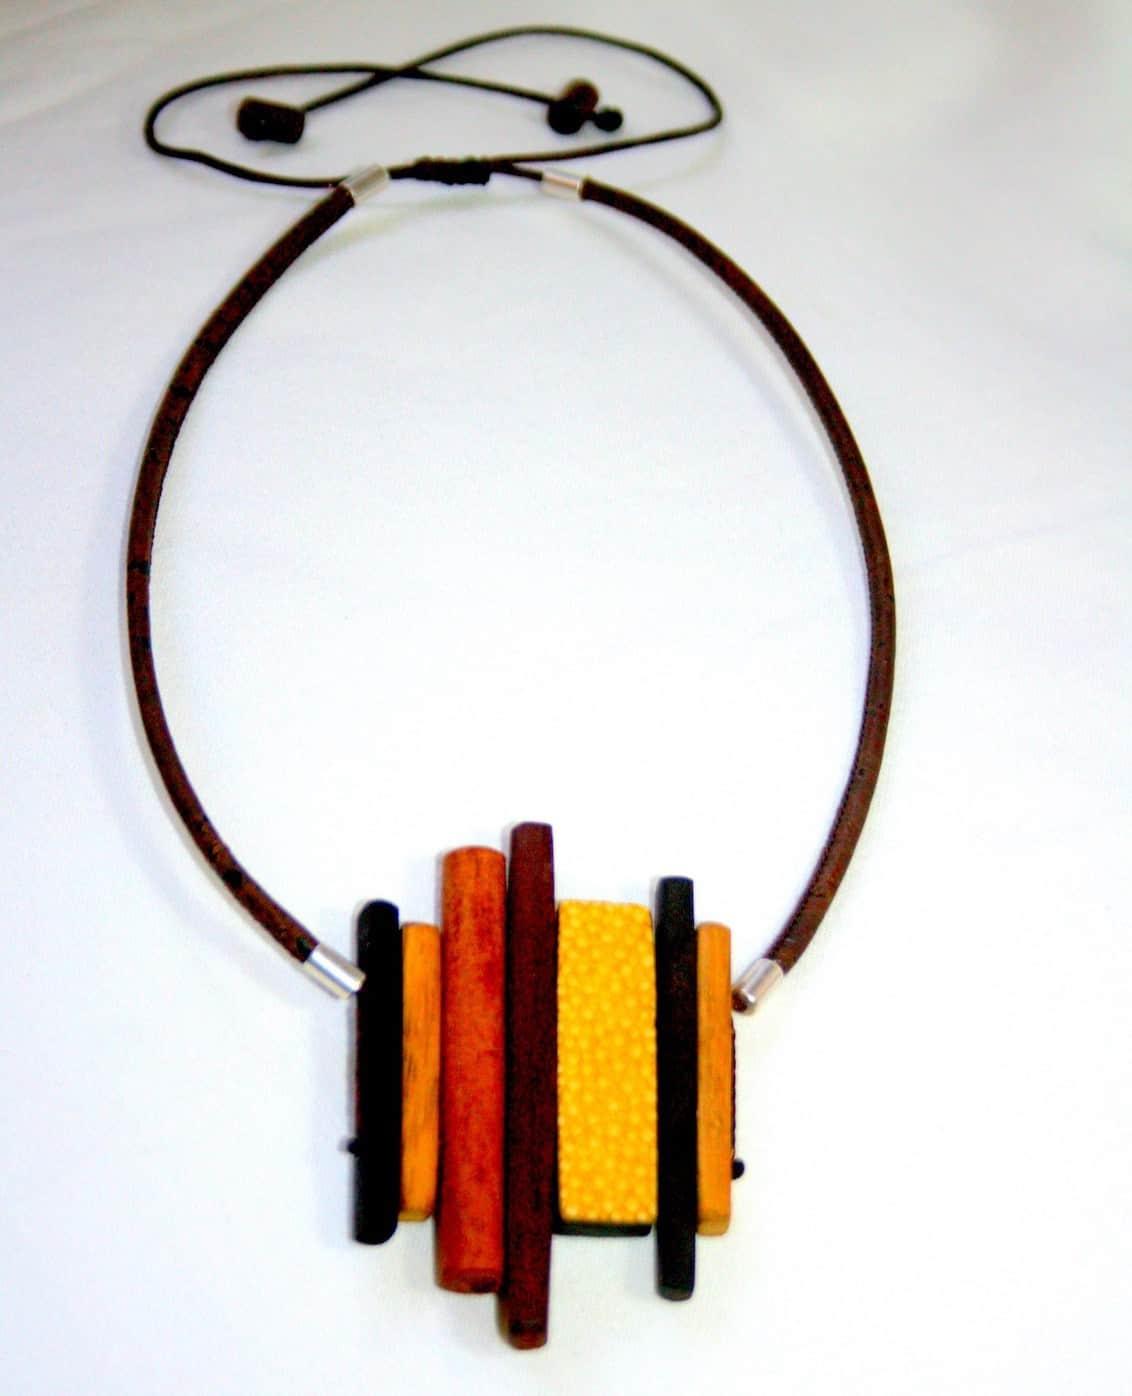 mauritius-arts-nathalie-laridain-différents-bois